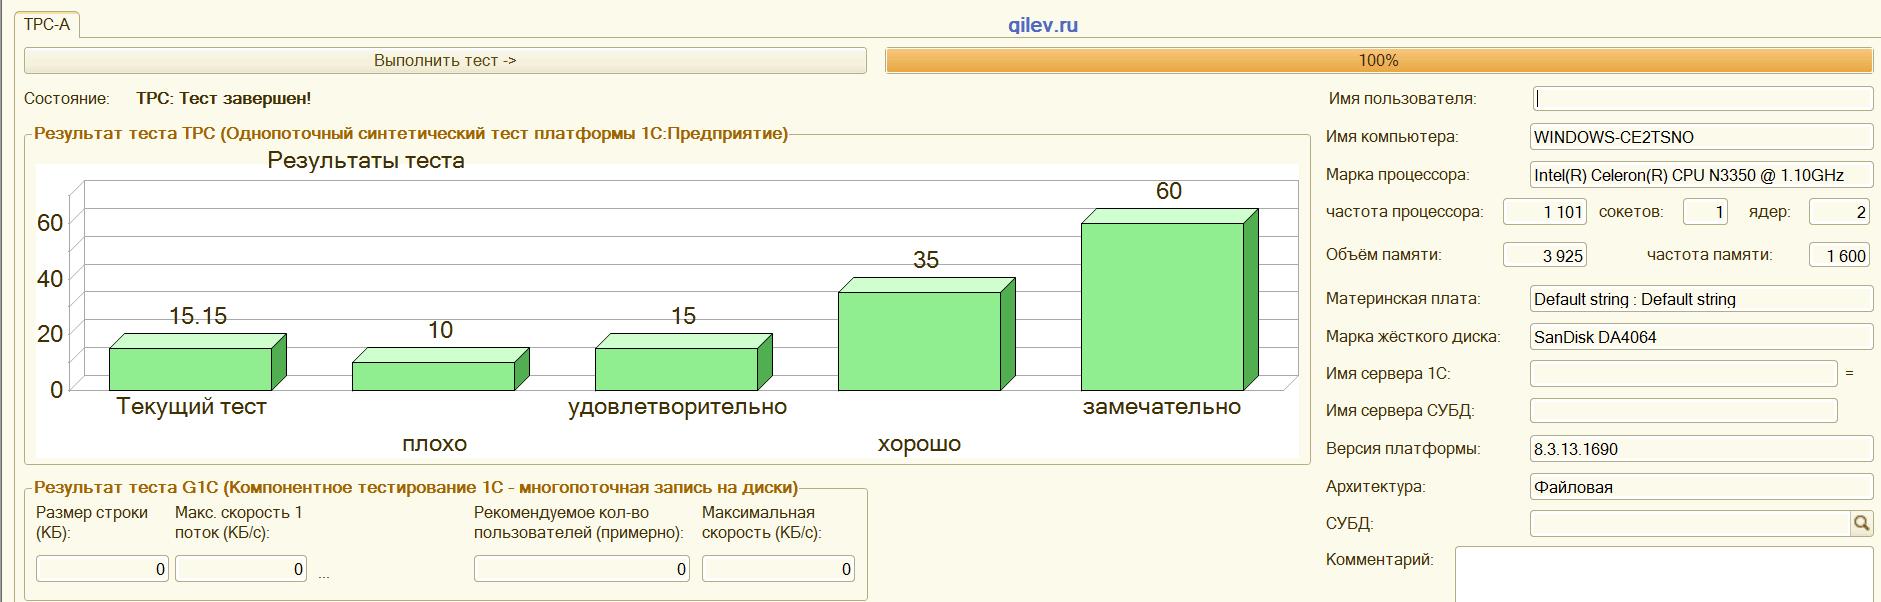 https://interface31.ru/tech_it/images/ATOL-monoblock-1C-014.png